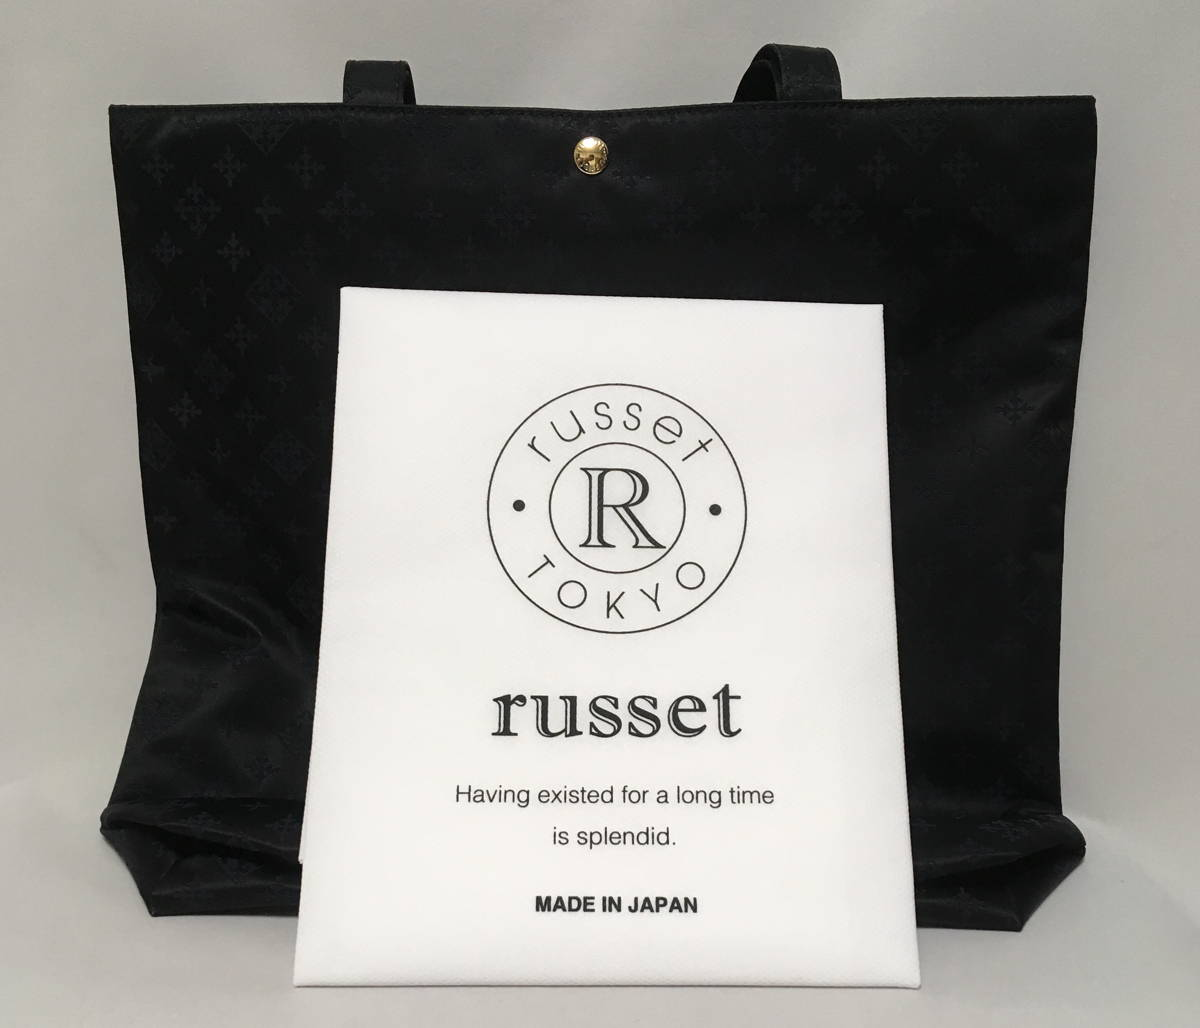 russet ラシット プレイン トート バッグ カバン サブバッグ 鞄 ナイロン ポリエステル Z-503 日本製 made in japan